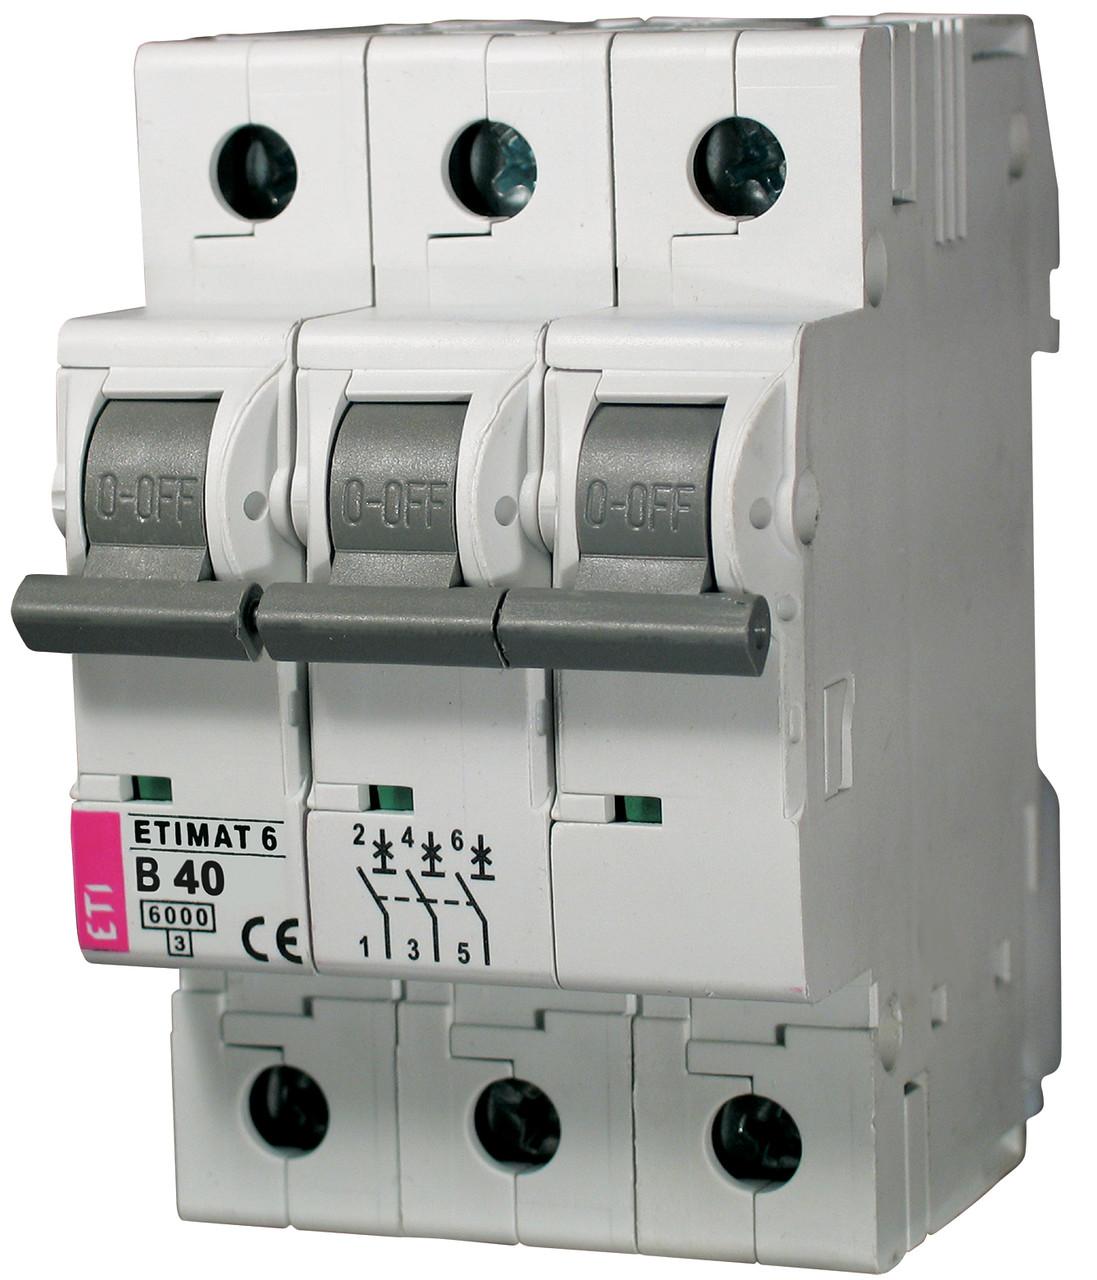 Авт. выключатель ETIMAT 6 3p B 40А (6 kA), ETI, 2115520